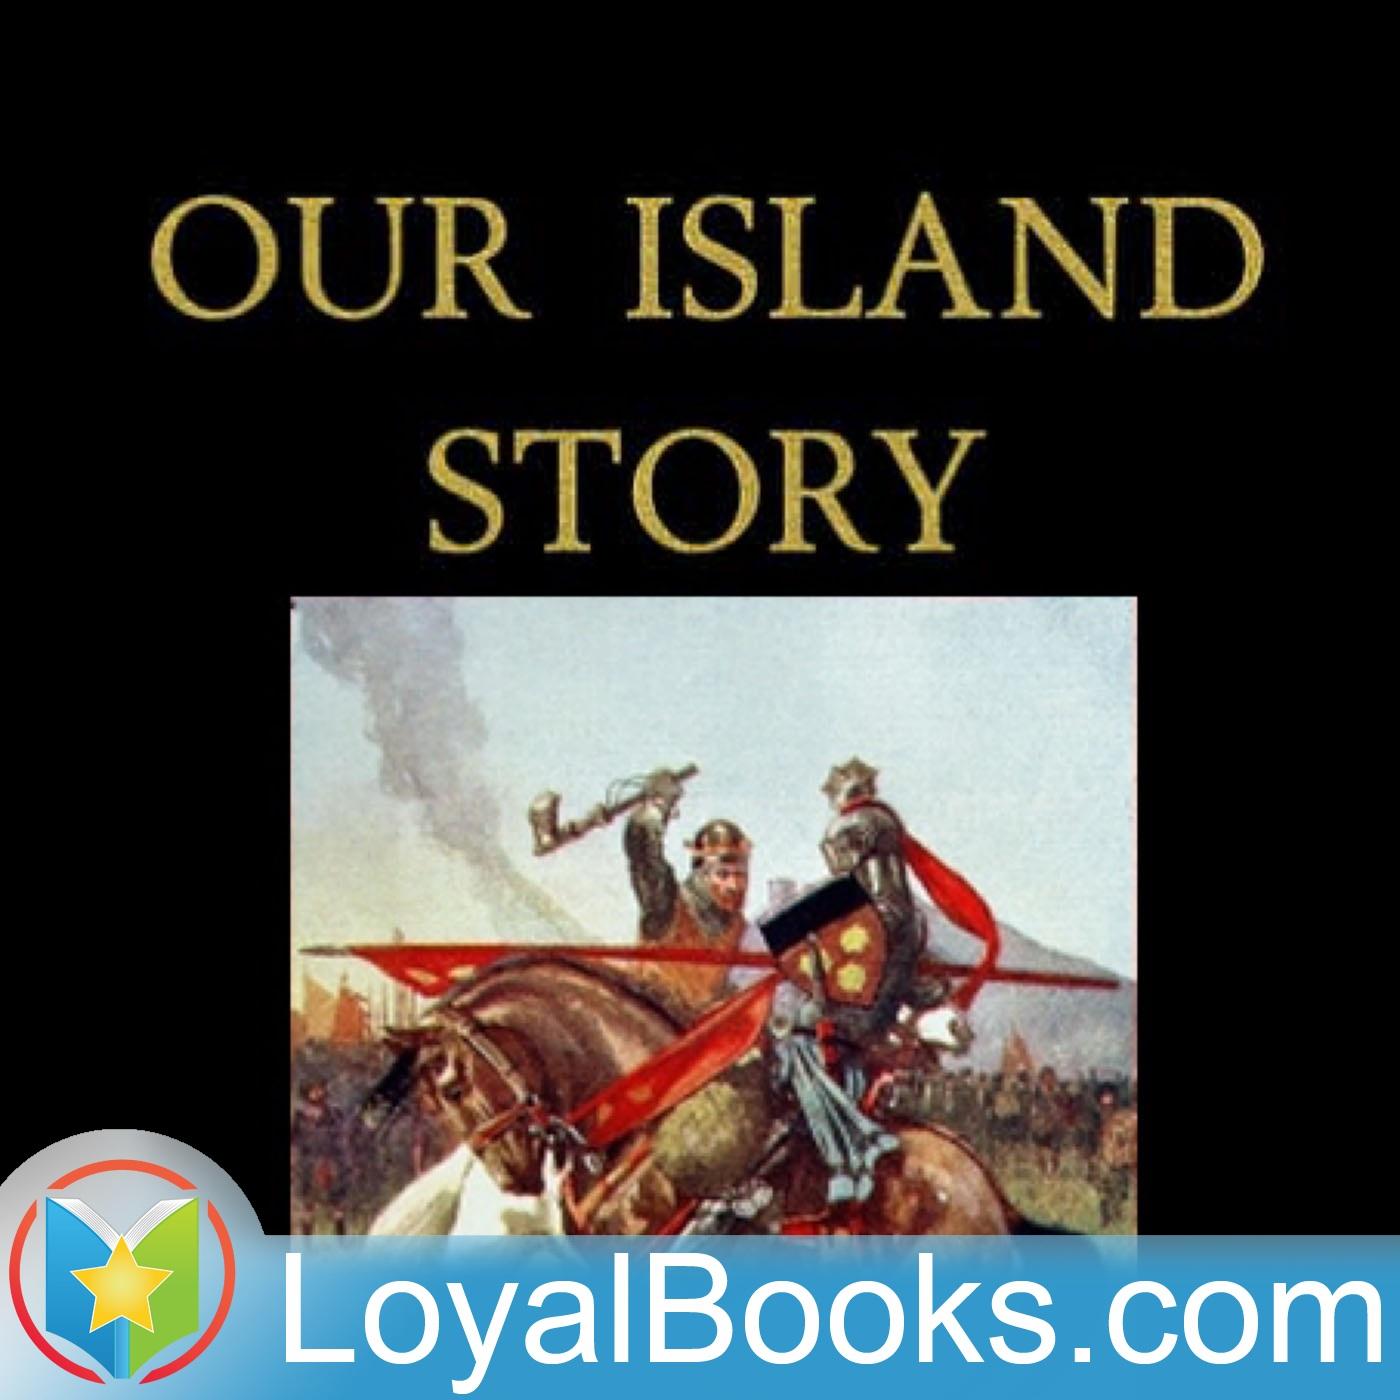 Our Island Story by Henrietta Elizabeth Marshall  